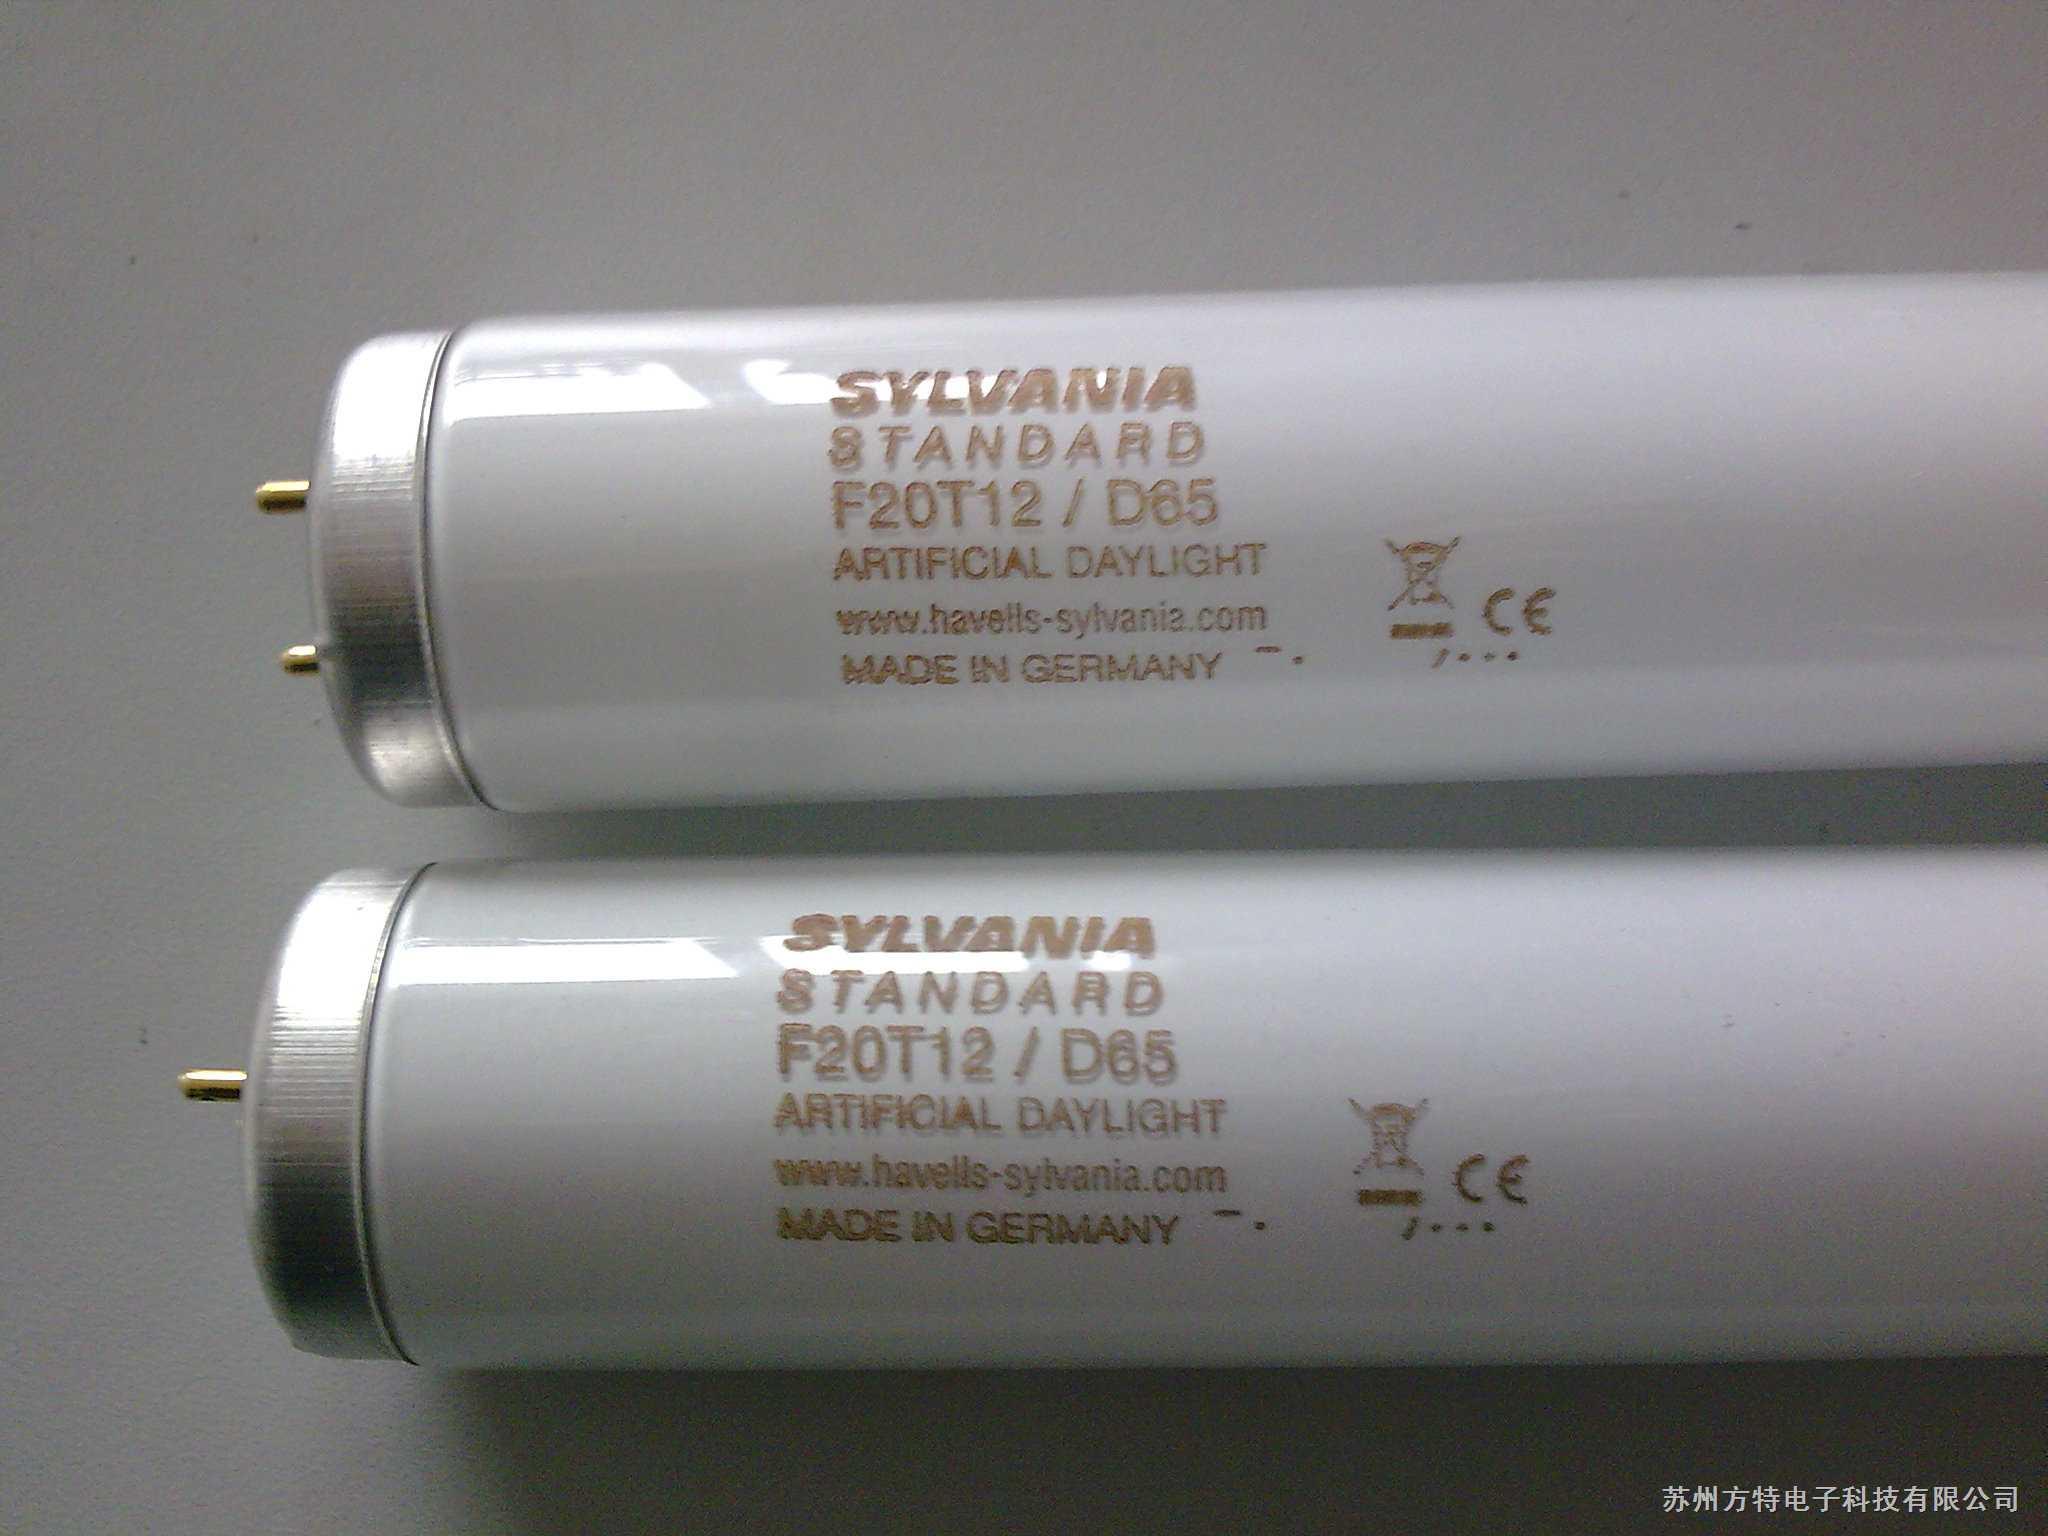 D65標準光源